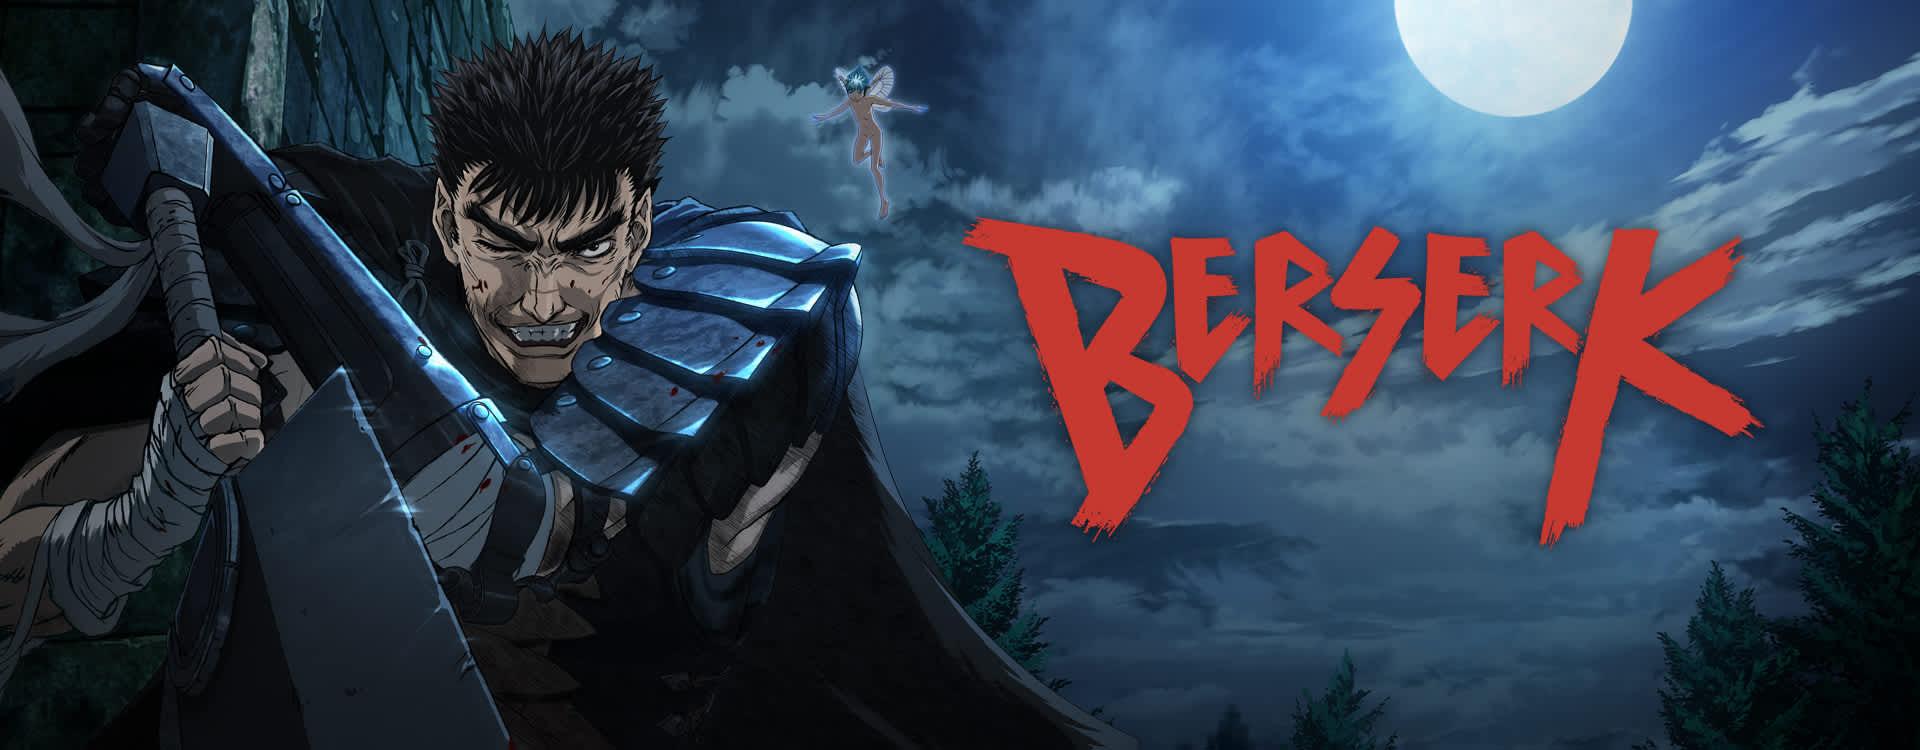 Berserk Anime Stream German